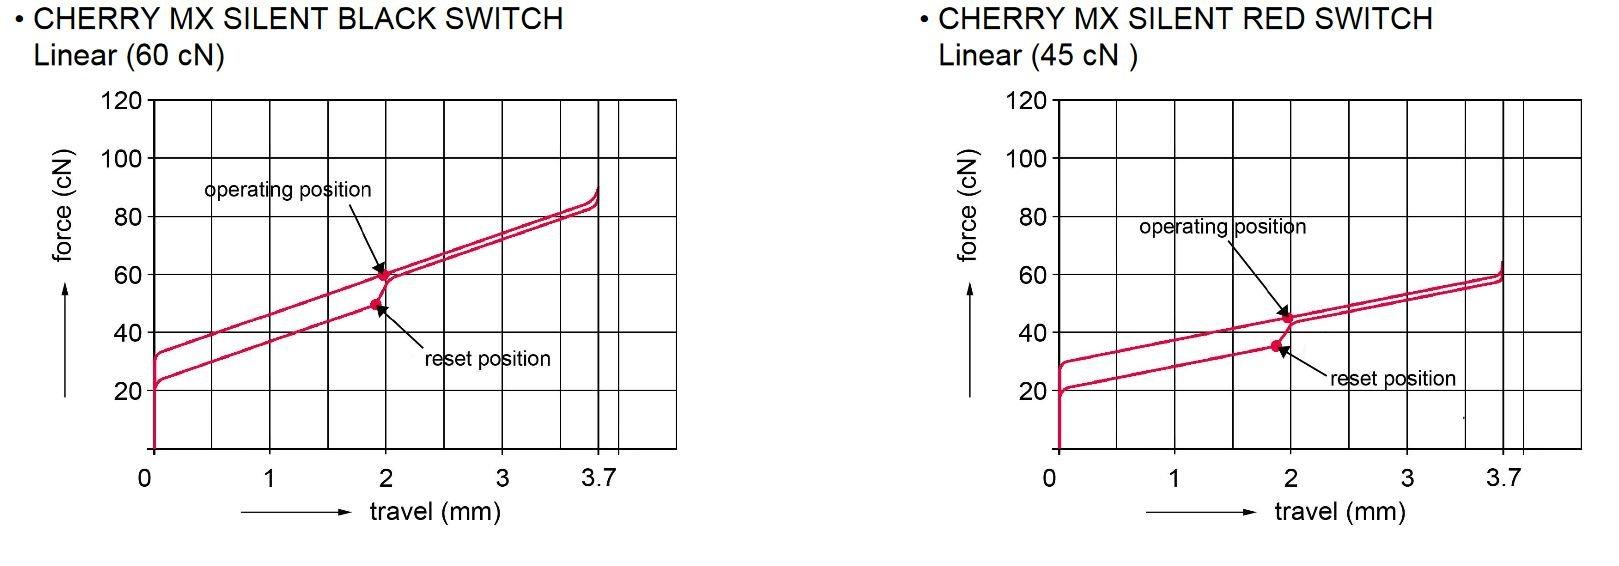 Kraftdiagramm Cherry MX Red & Black